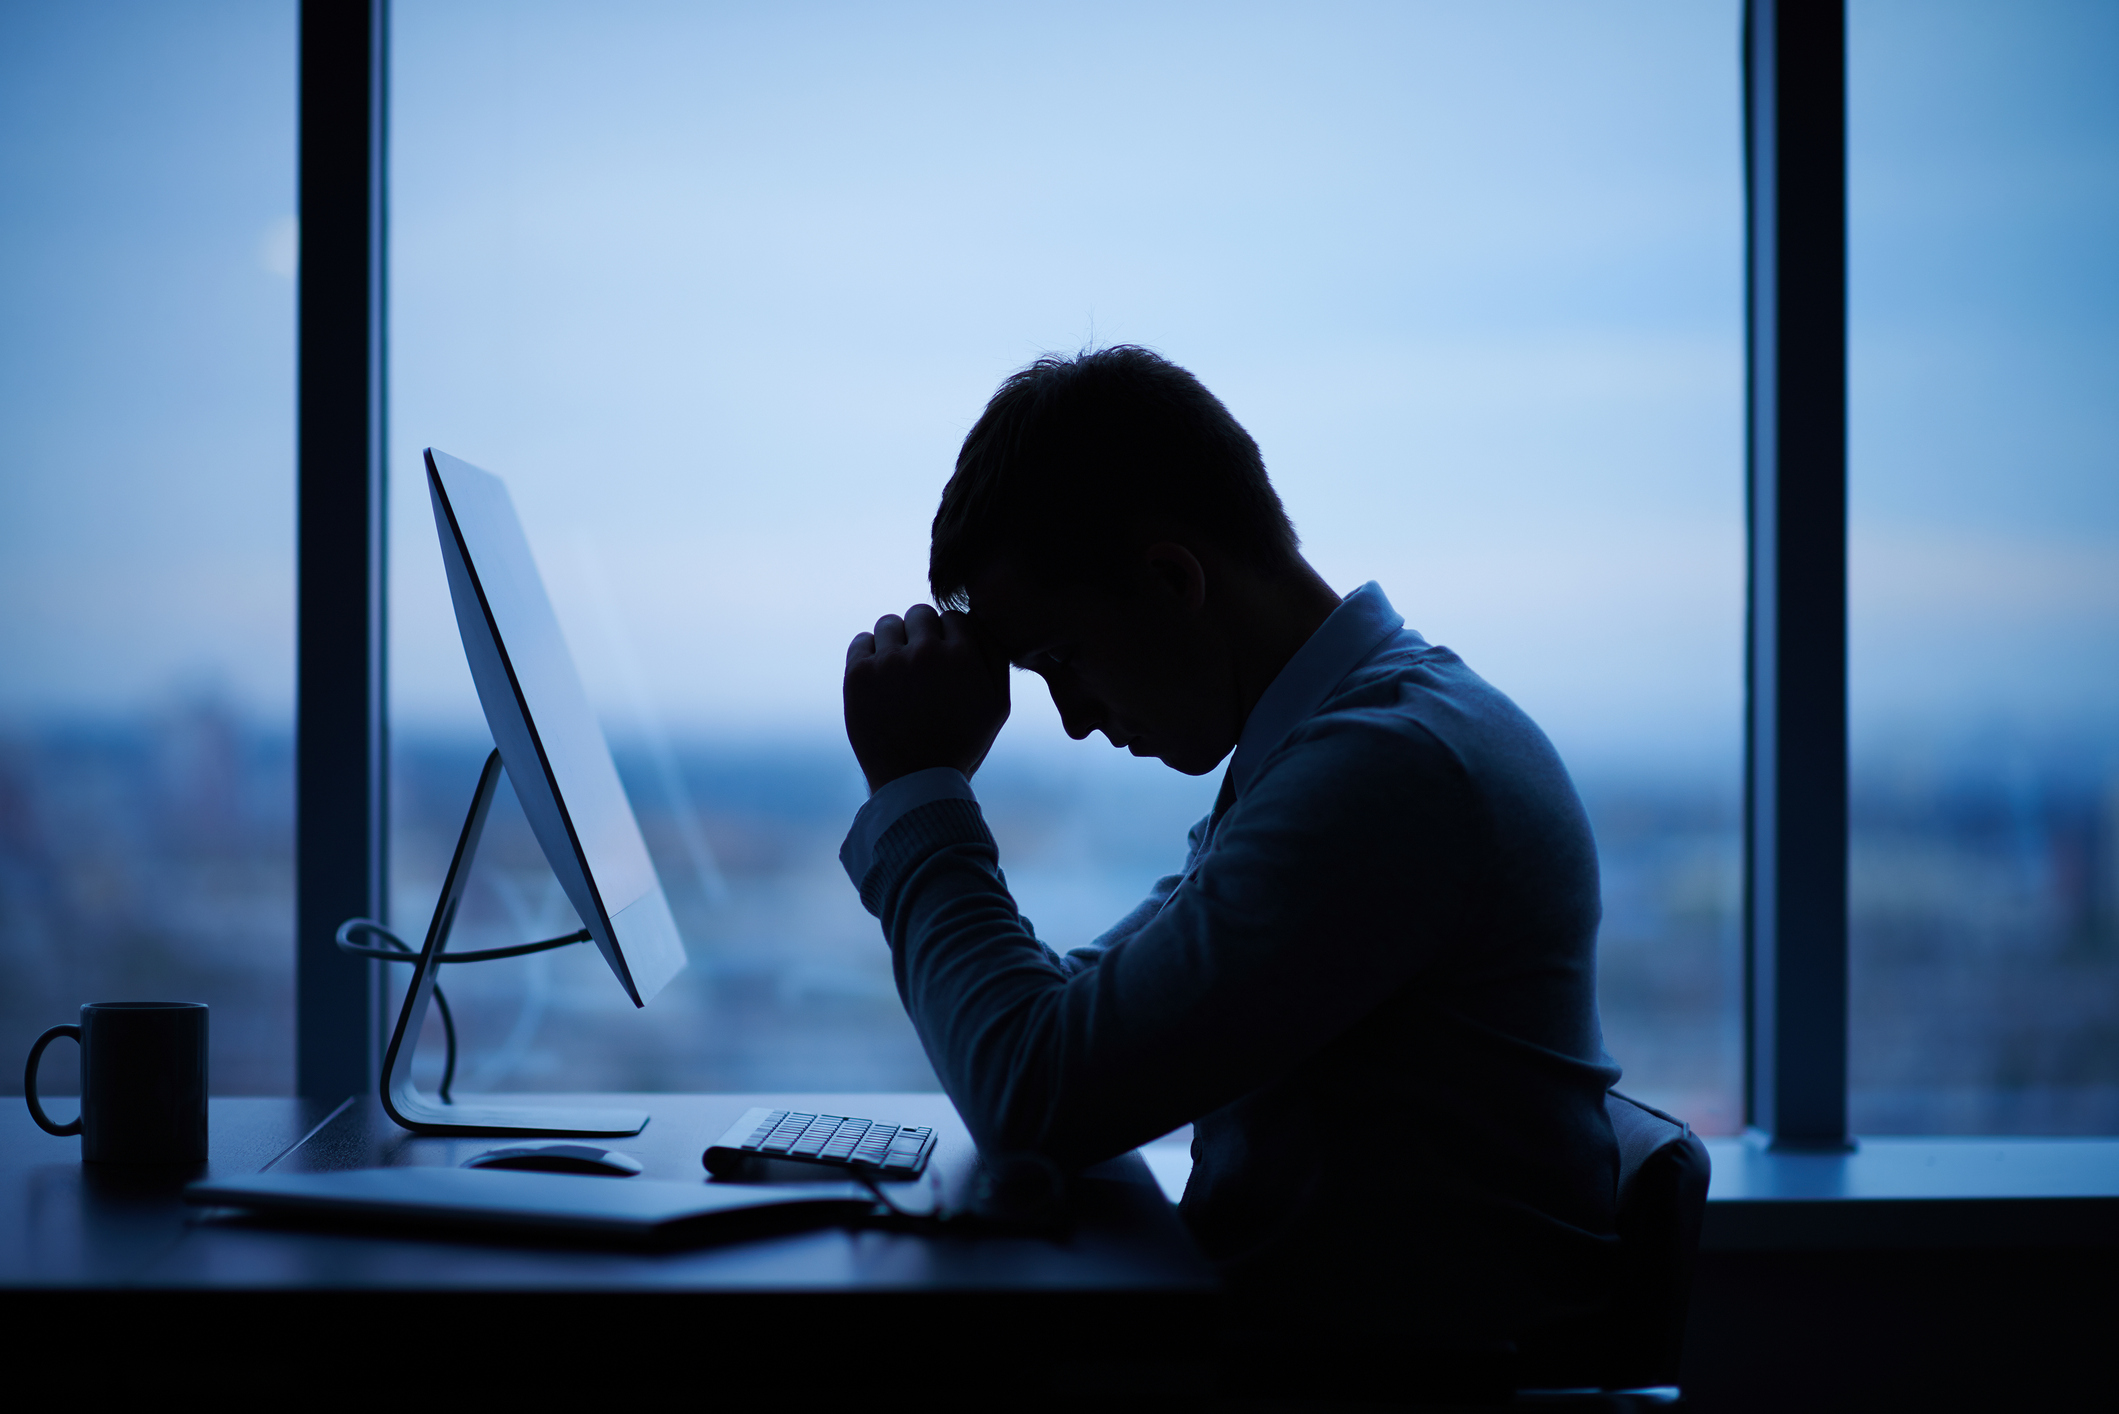 man sat at a laptop